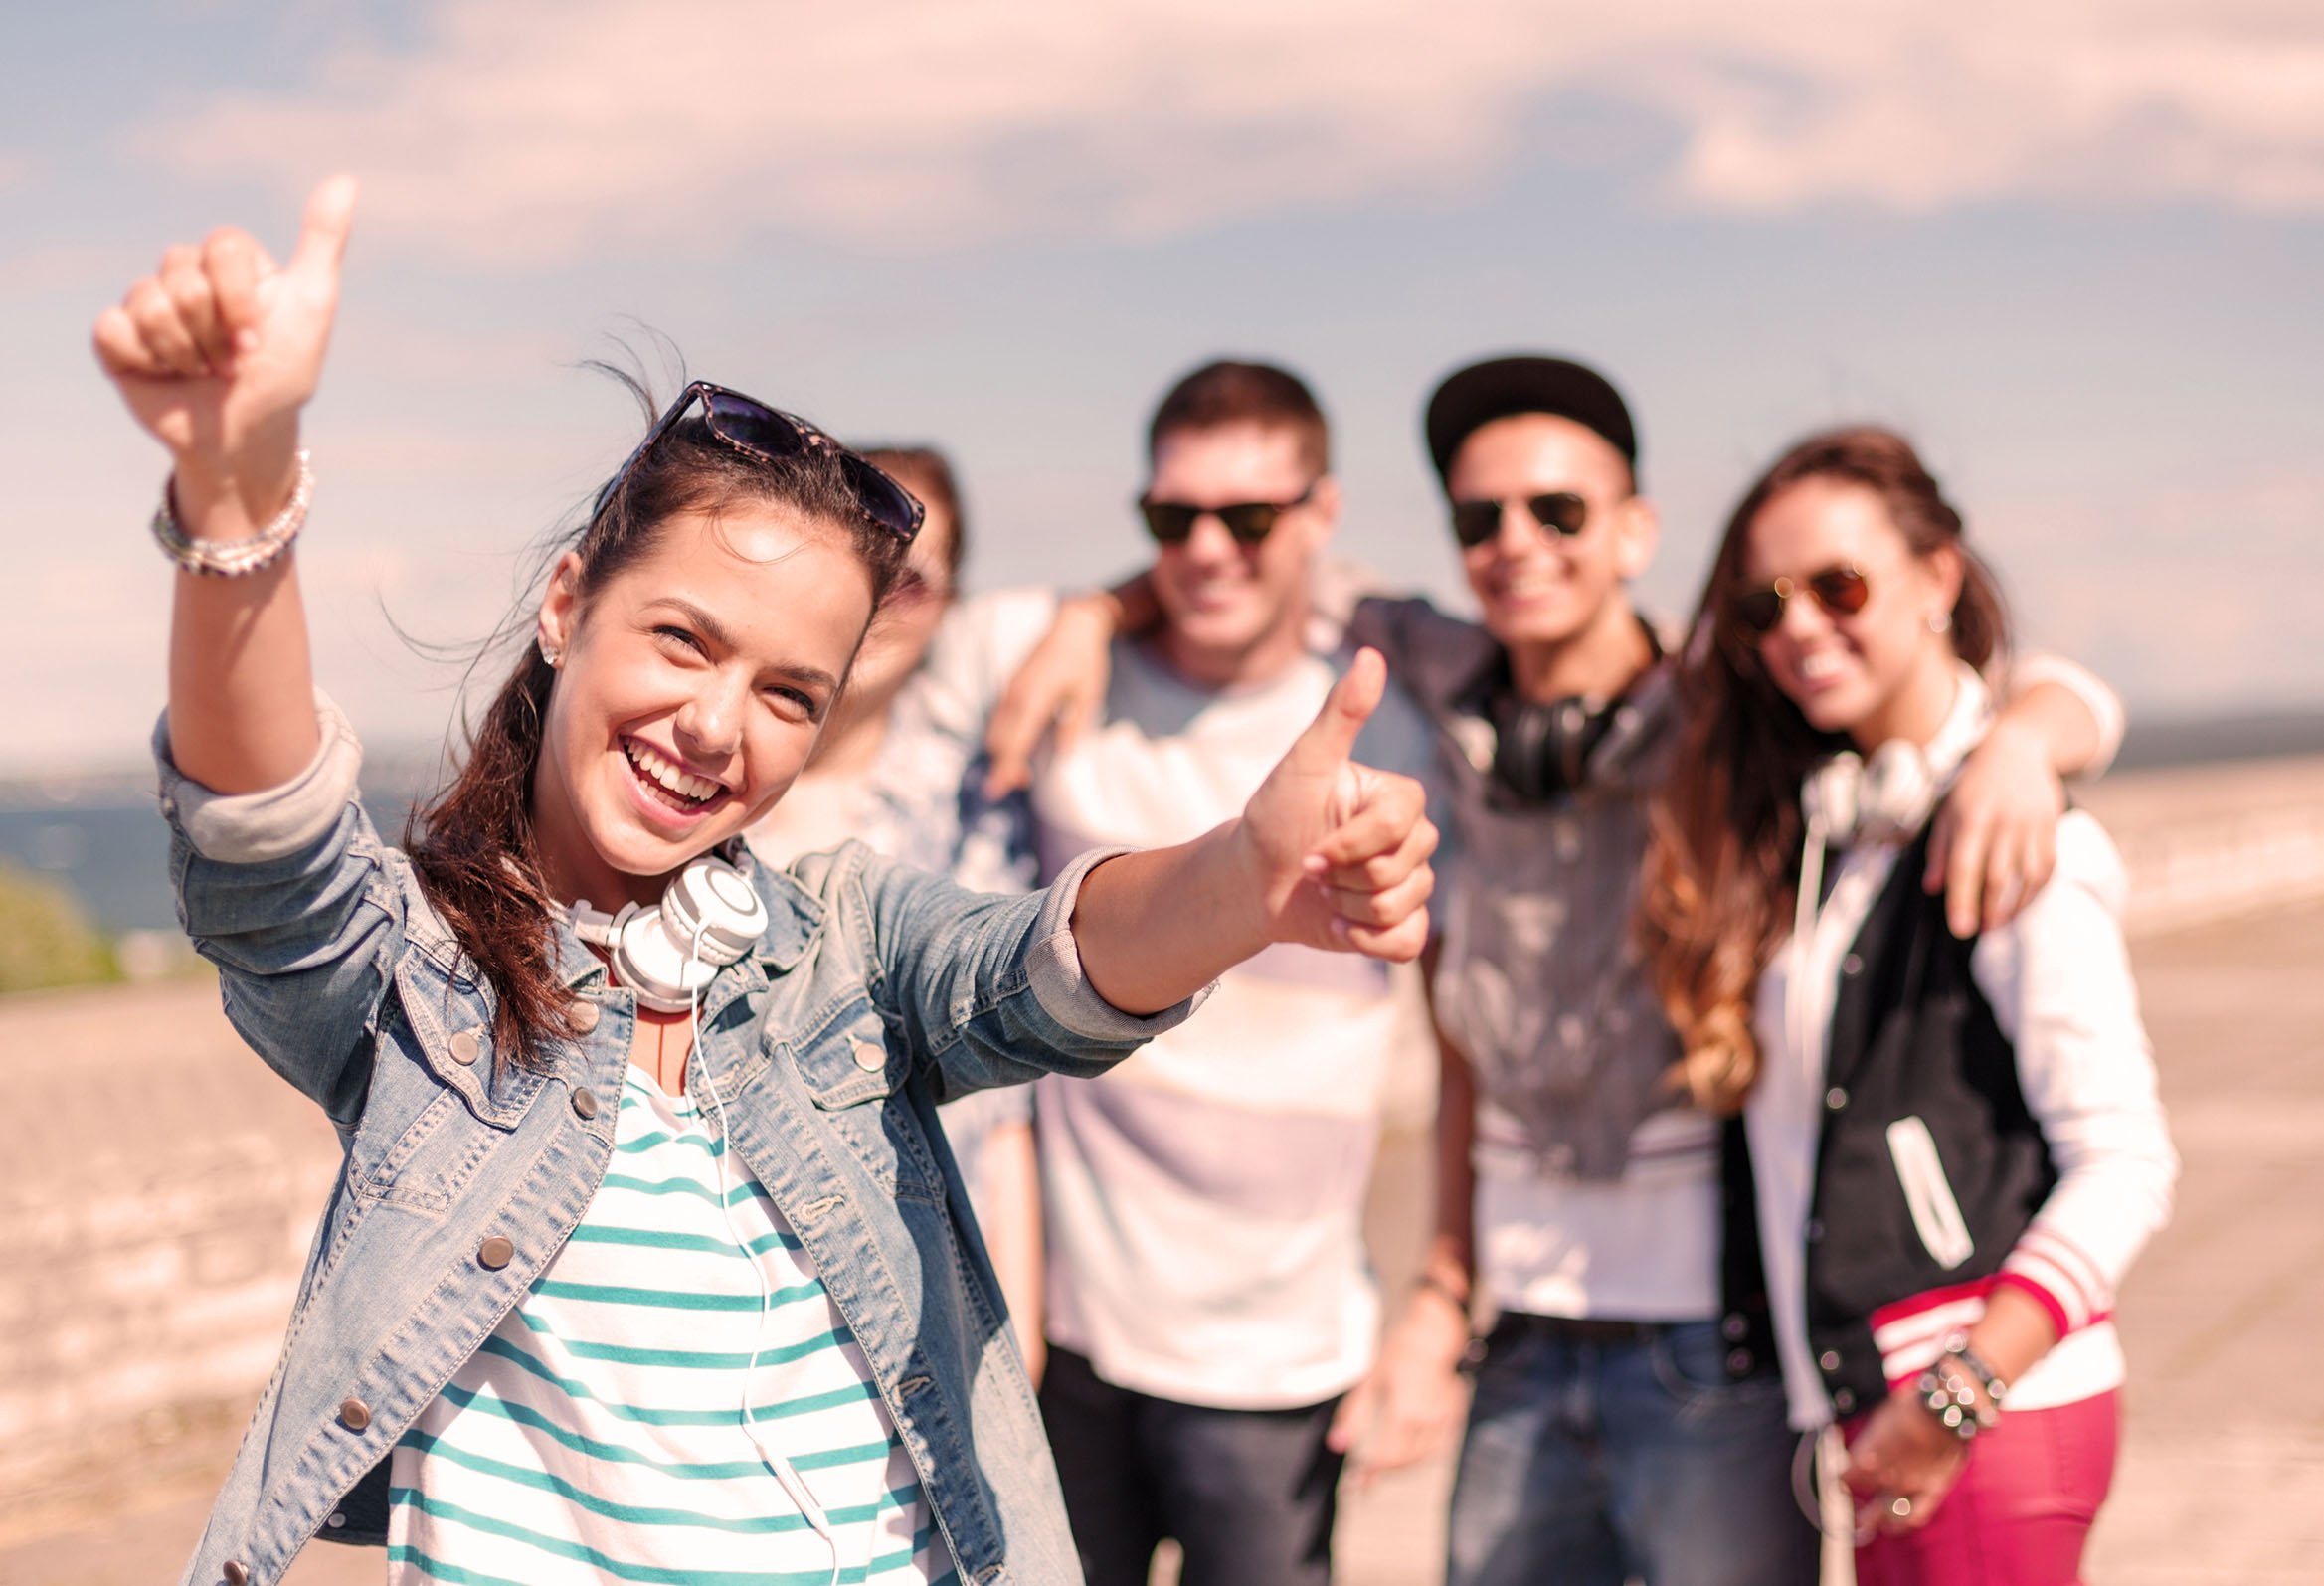 Молодо, да зелено: выпадение волос у подростков